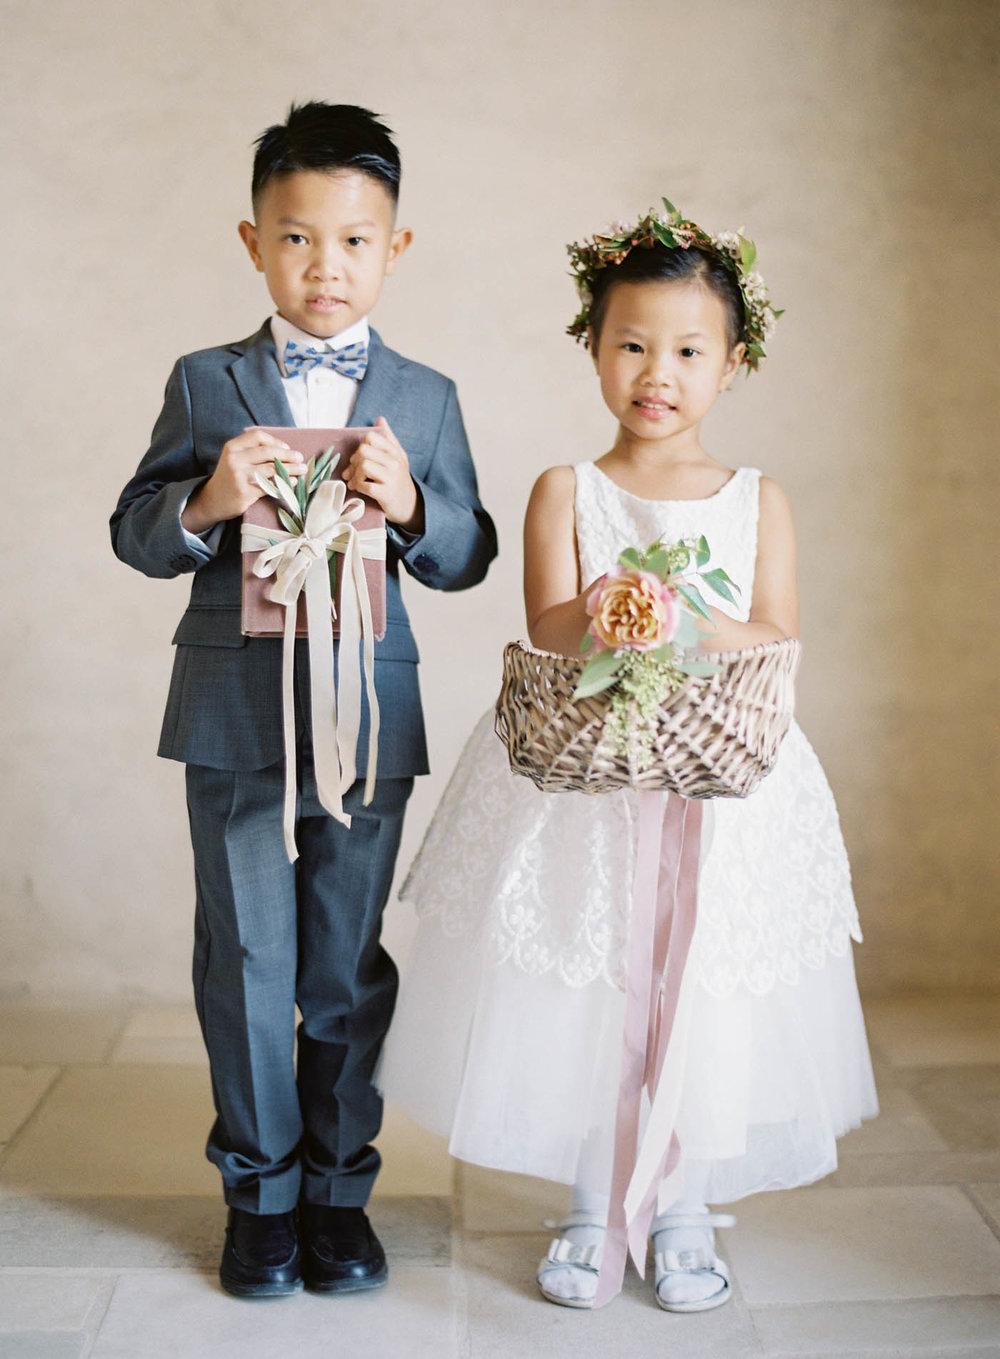 sunstone-villa-wedding-10-Jen_Huang-RD-44-Jen_Huang-009581-R1-007.jpg